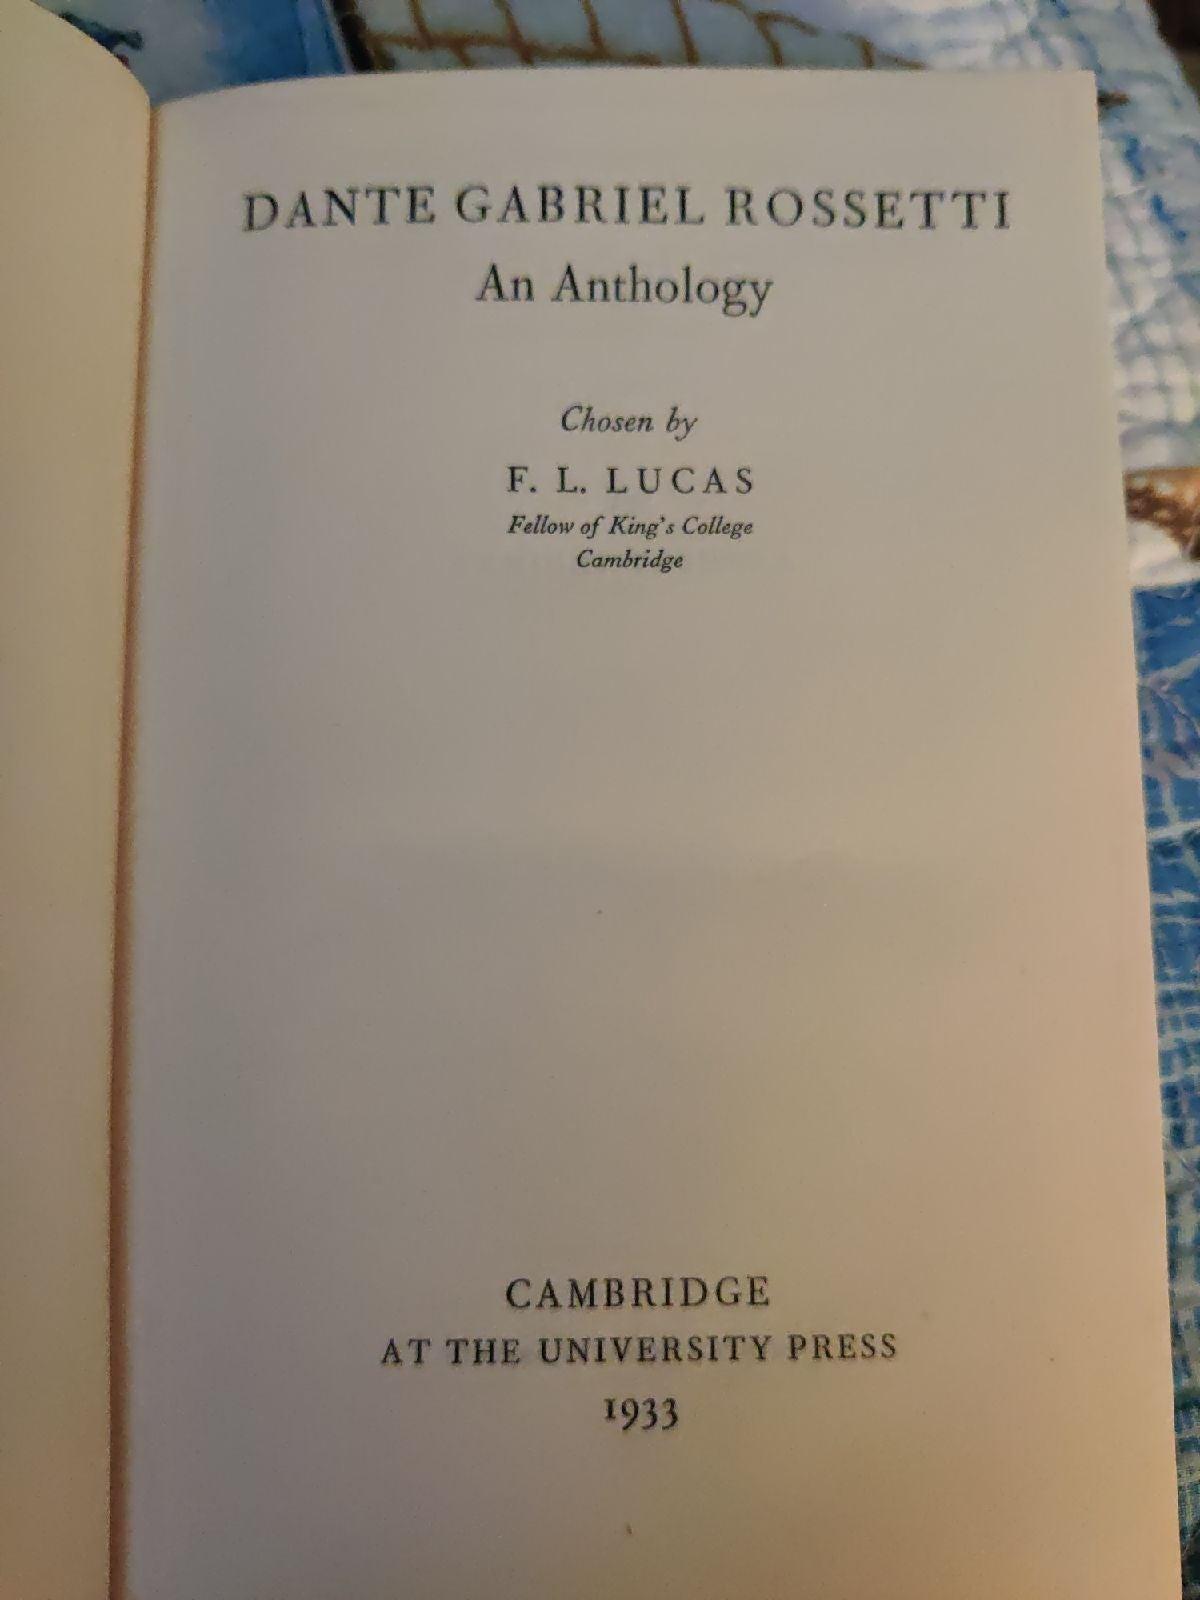 D.G. Rossetti Anthology